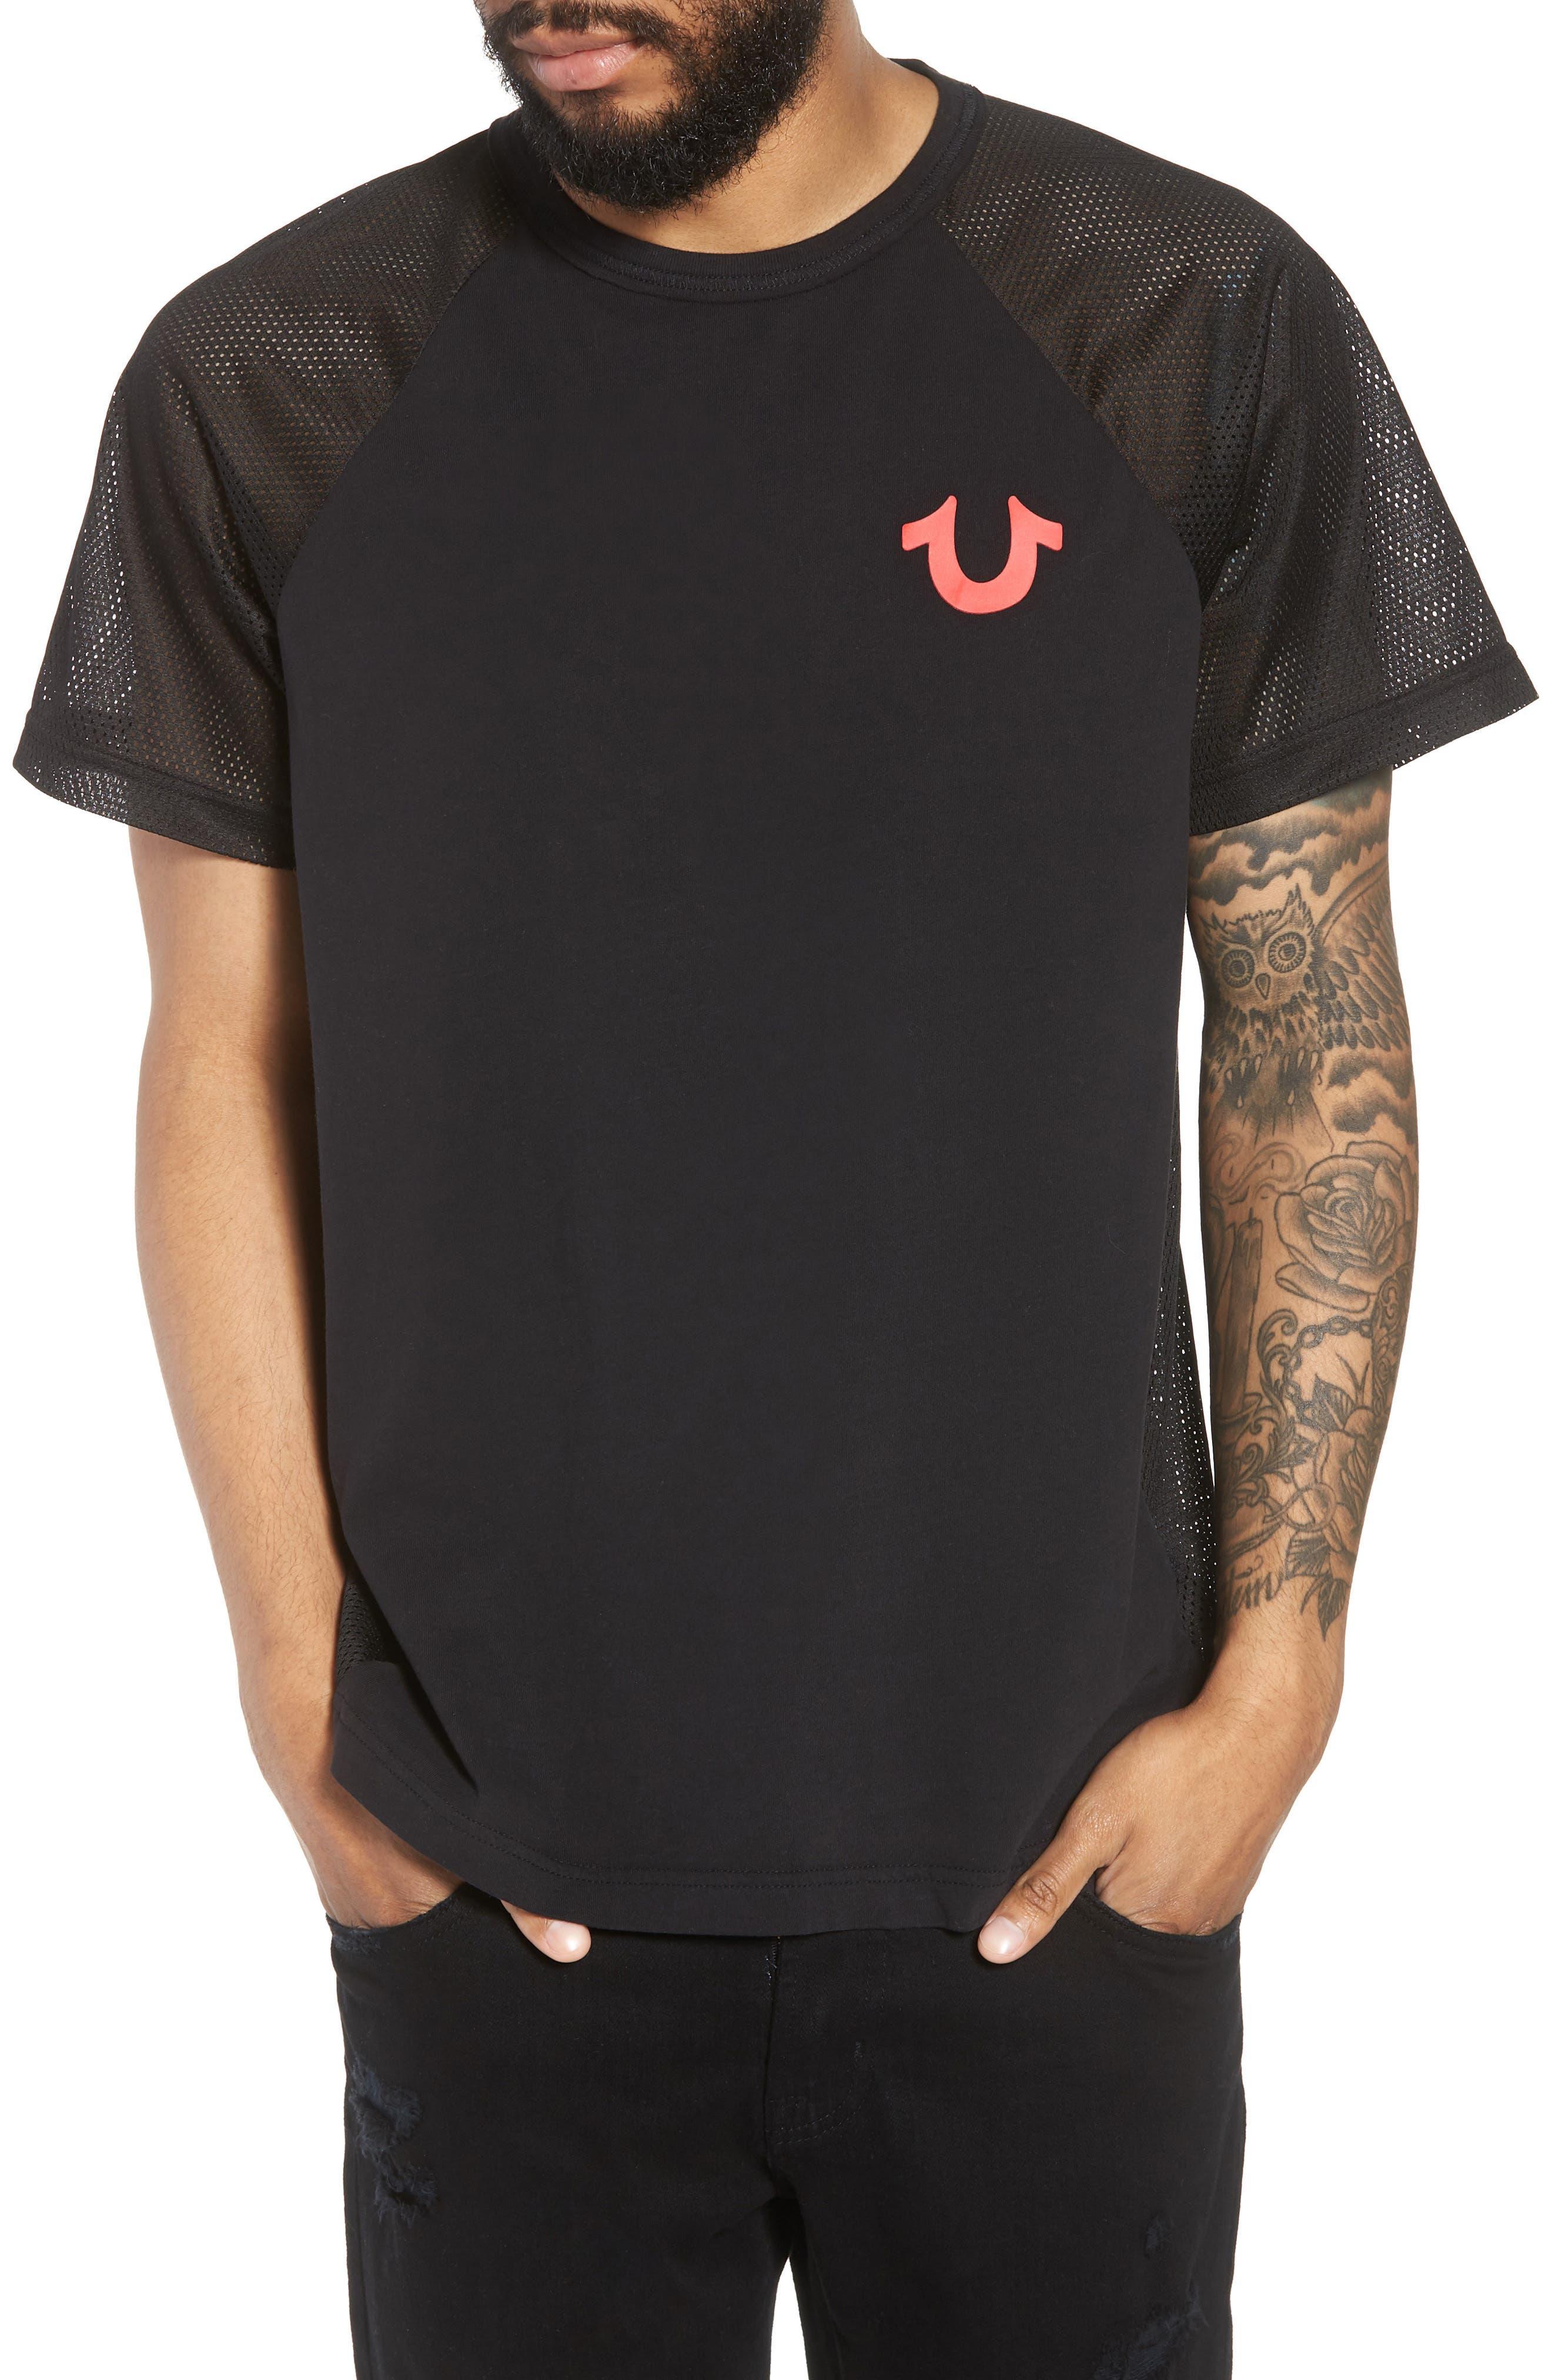 True Religion Brand Jeans Solid Raglan T-Shirt